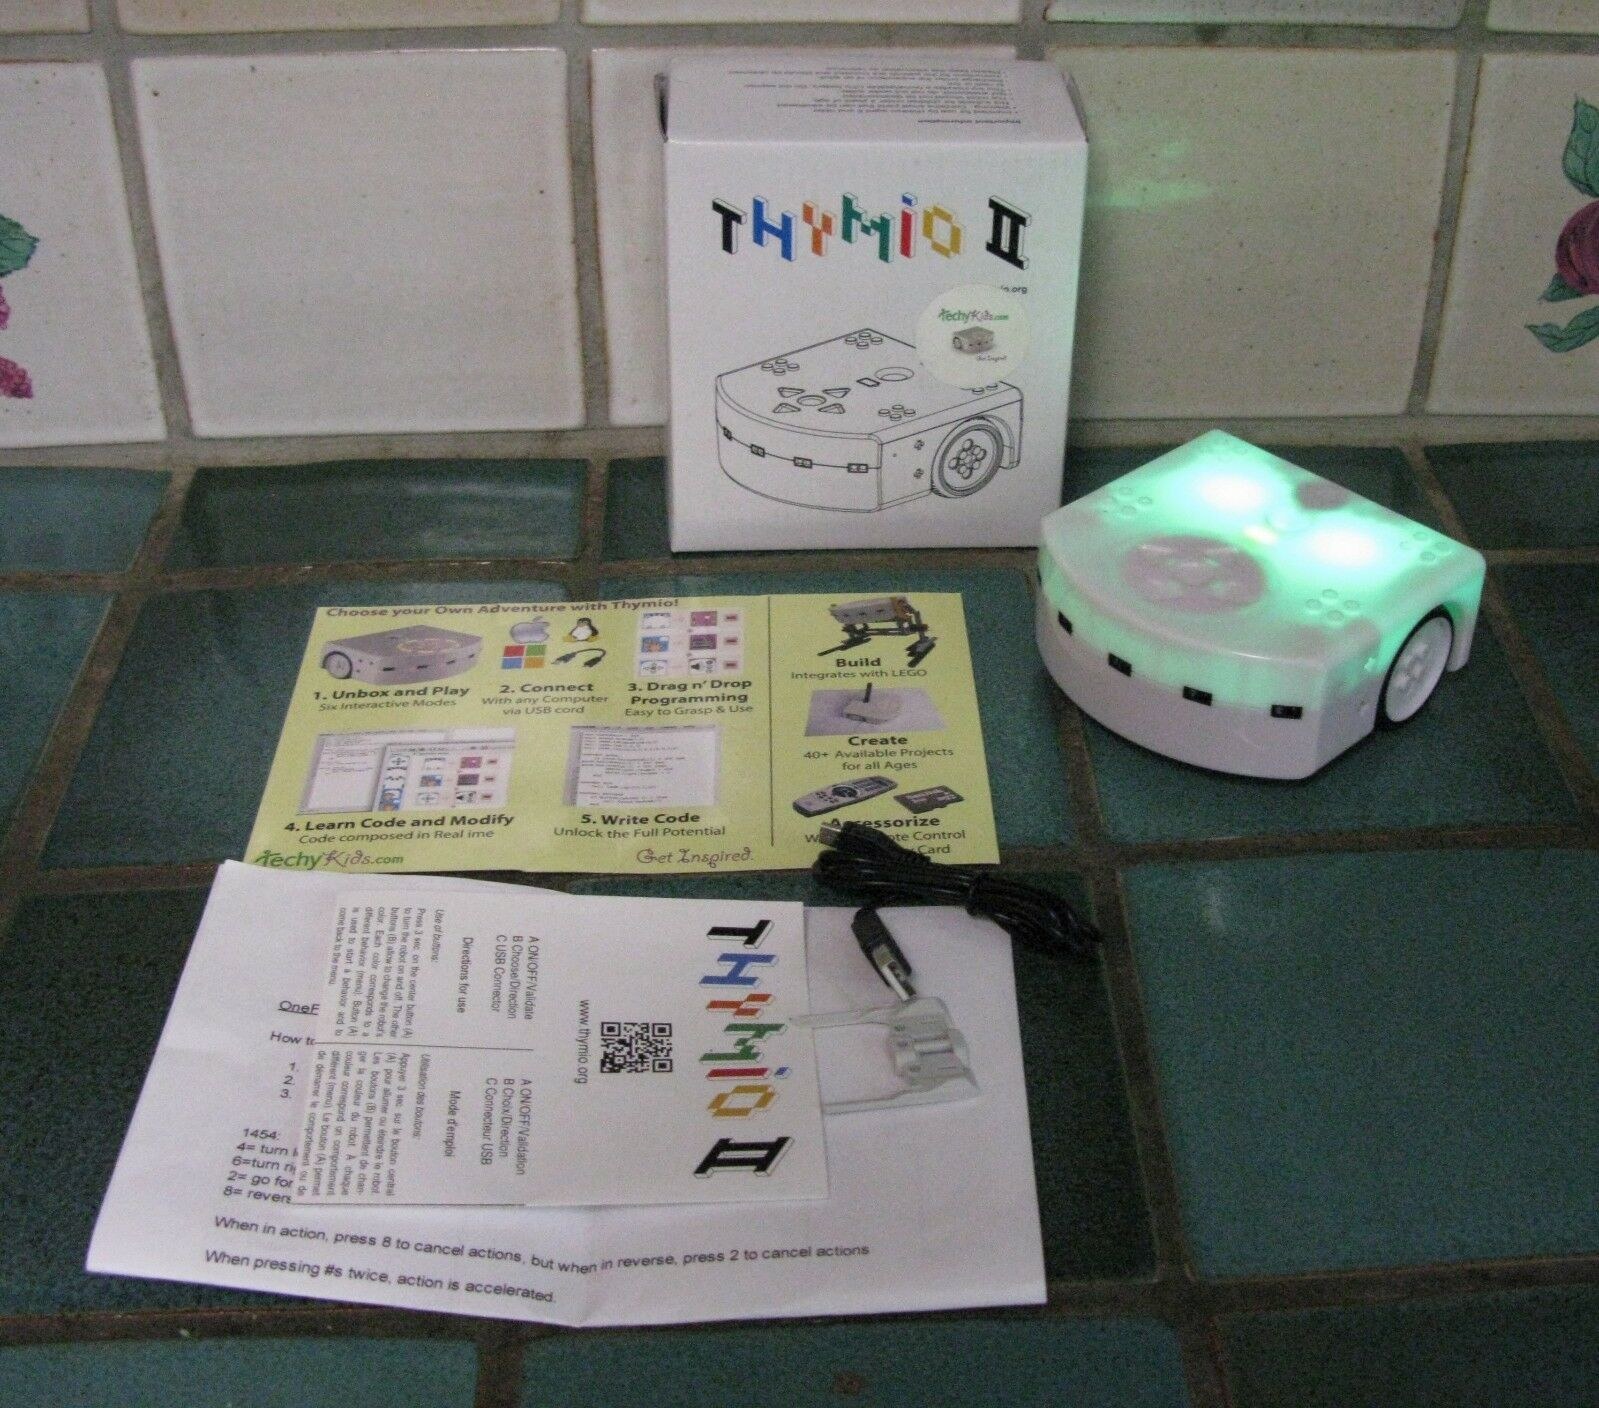 EDUCATIONAL WIRELESS ROBOT THYMIO II (WORKS WITH LEGOS ) ) ) 8bfea9